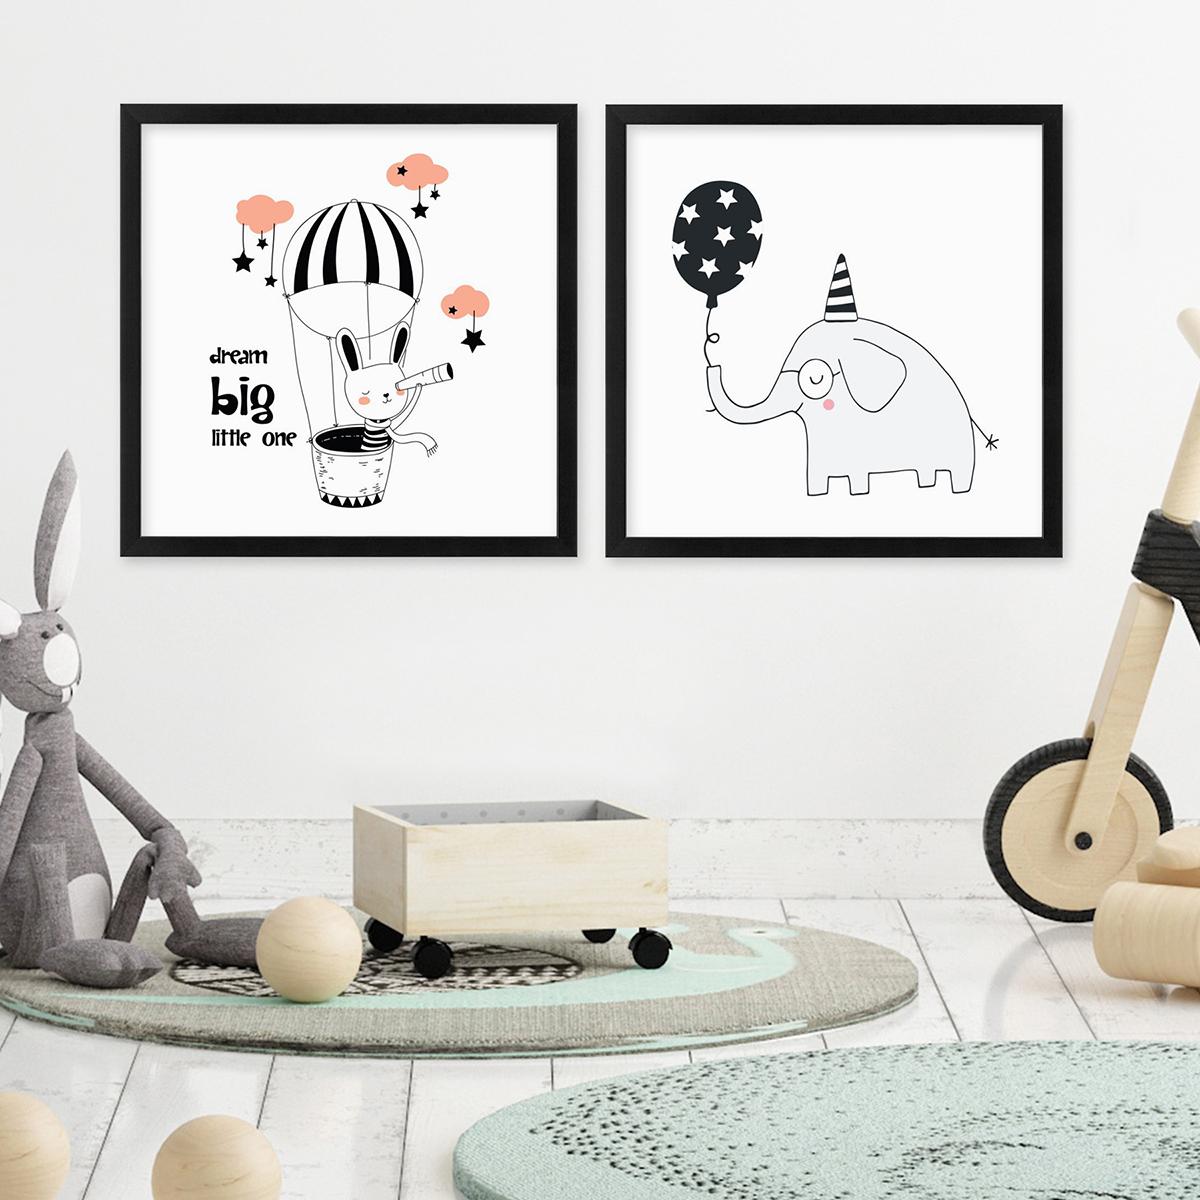 2er Set Kinder-Poster No.18 mit Bilderrahmen Schwarz 30x30 cm Rosa ...